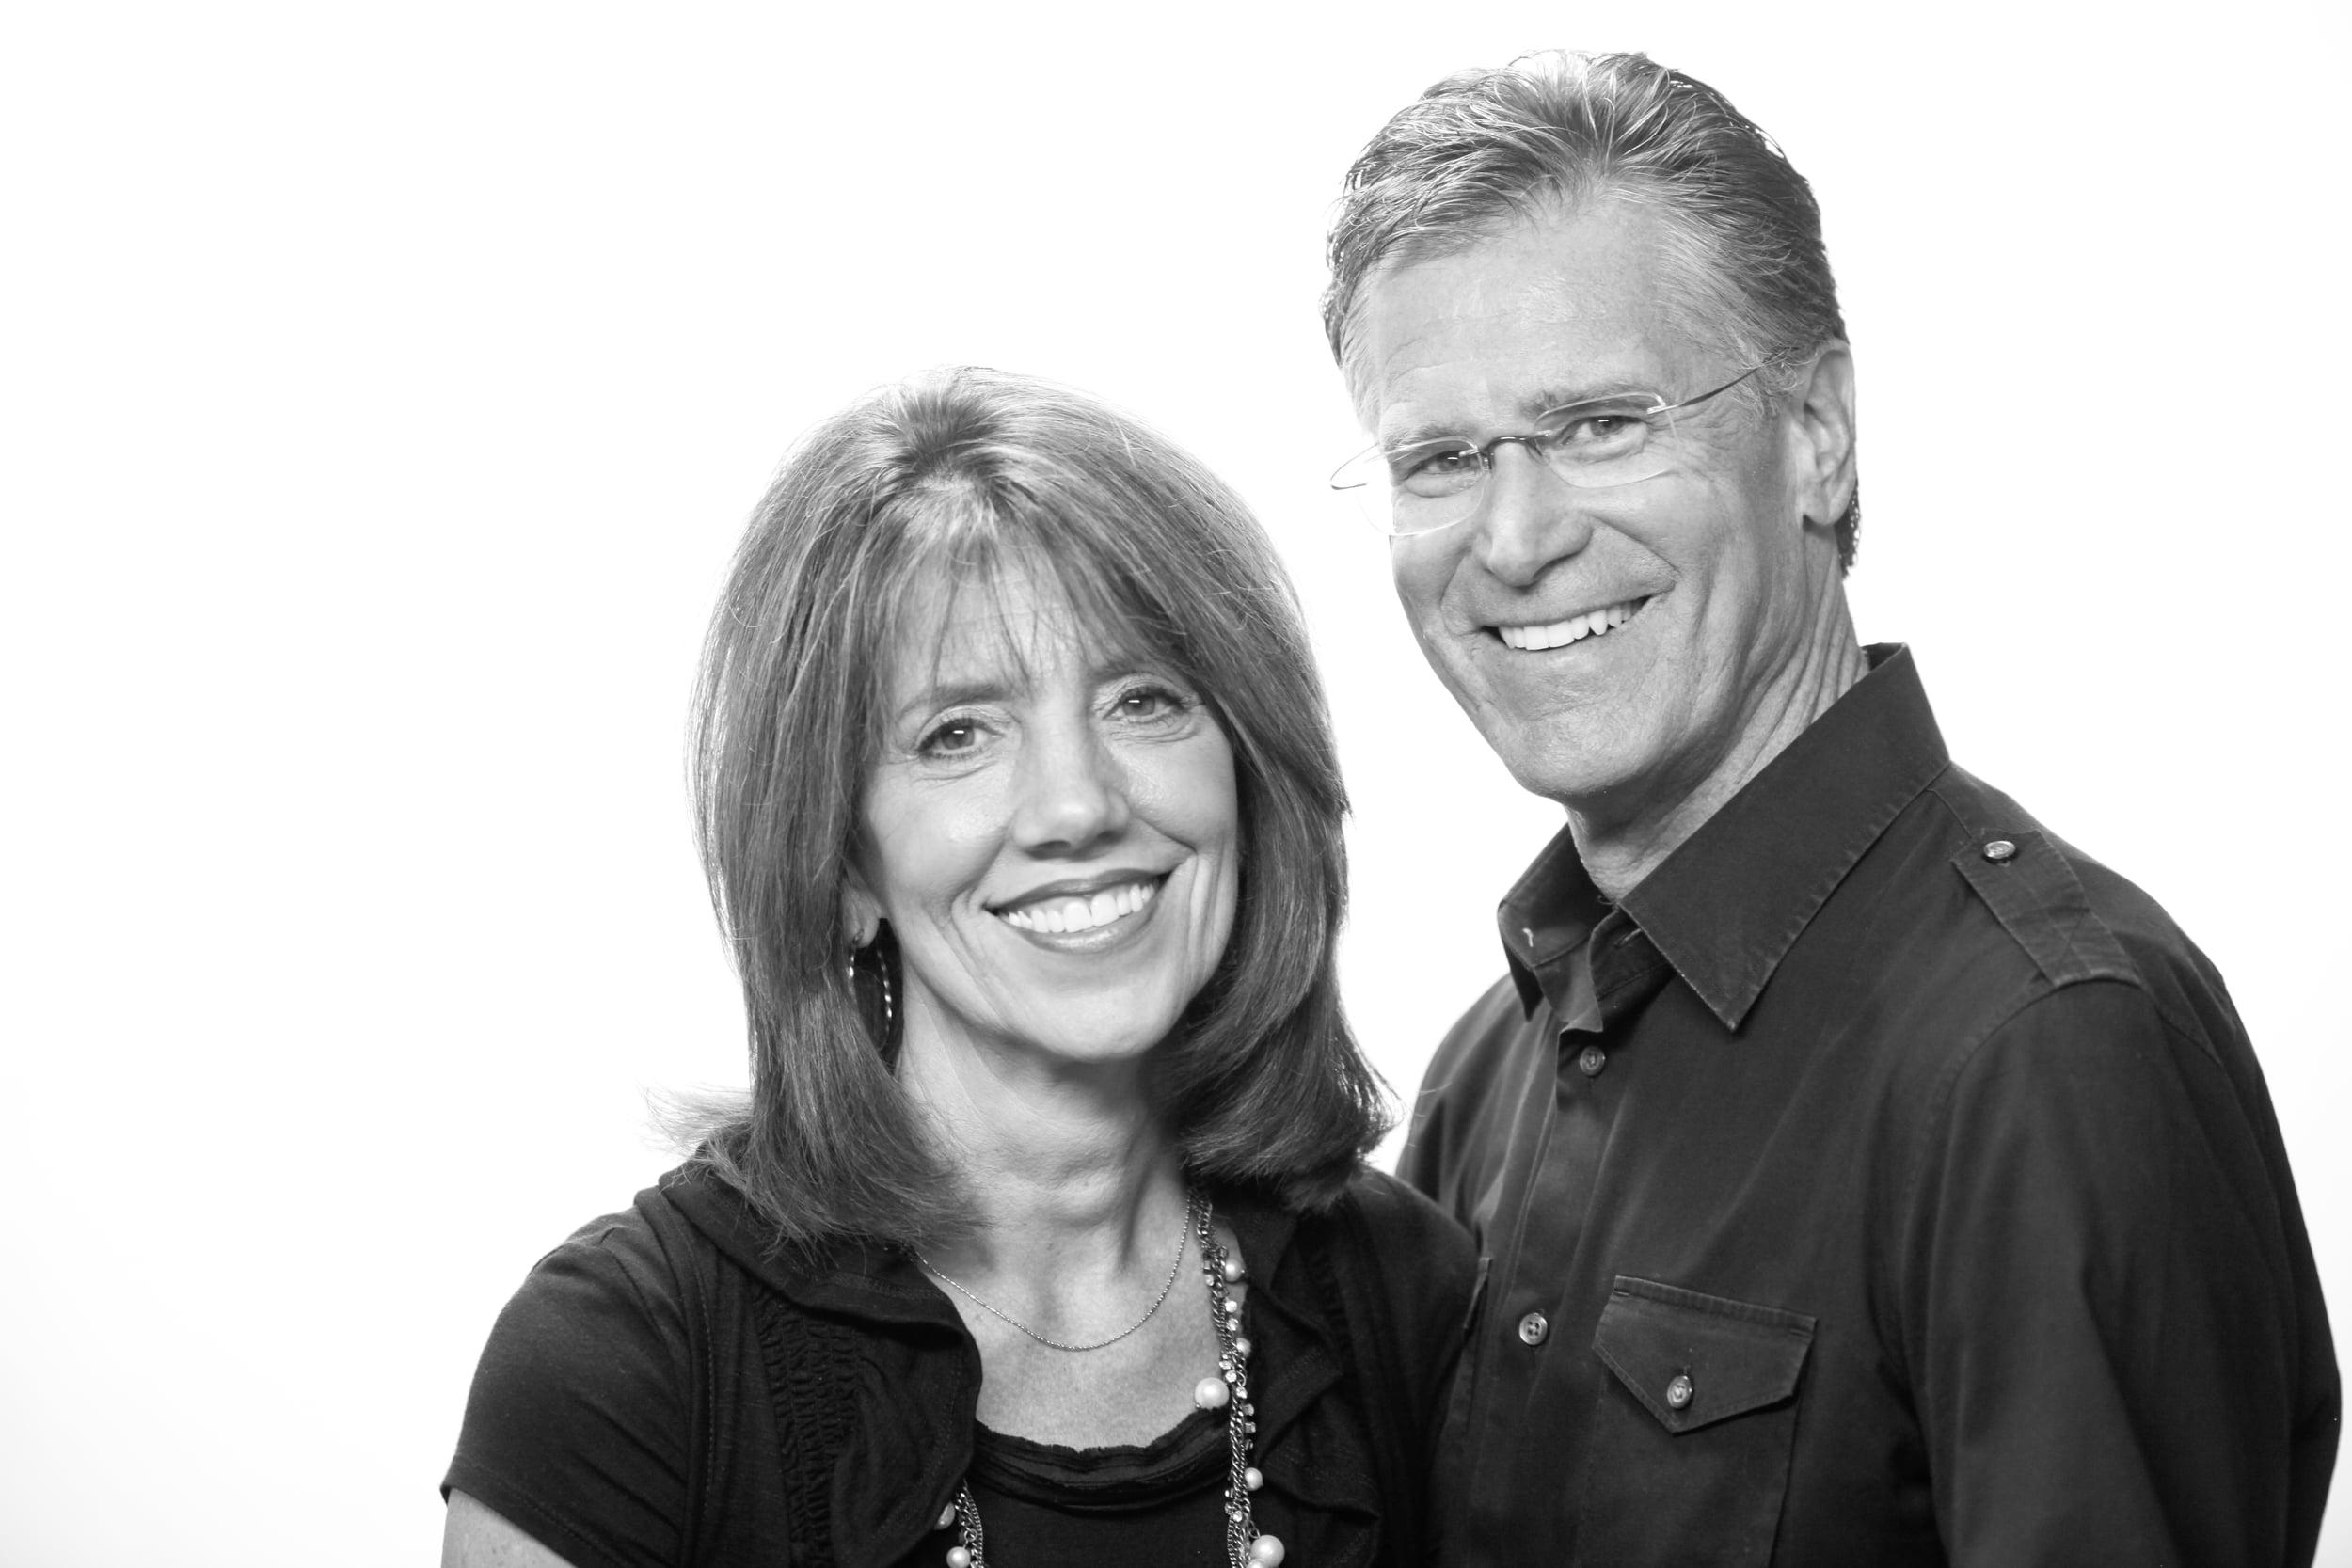 Emerson and Sarah Eggerichs